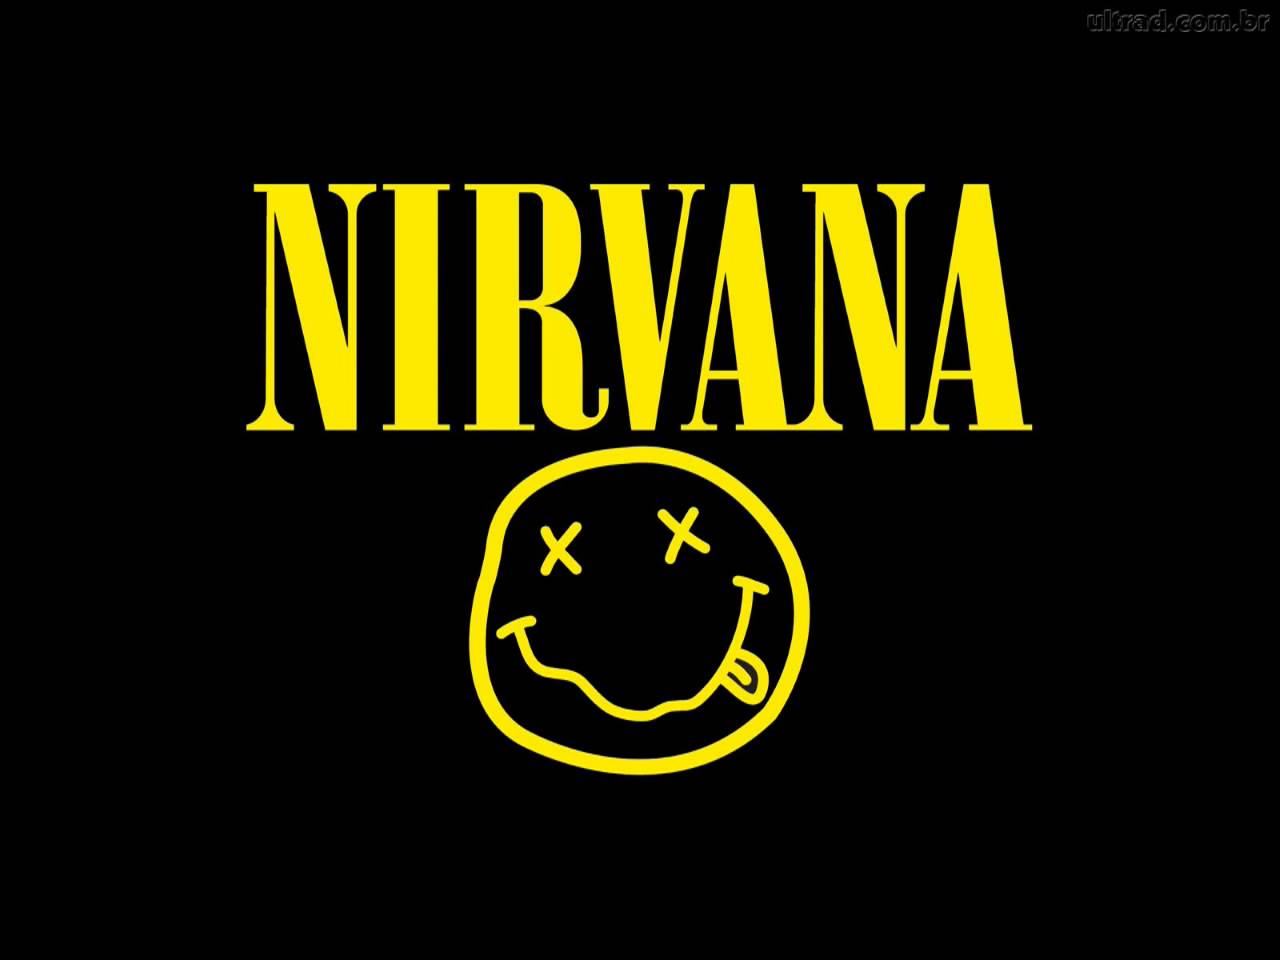 Smells like teen spirit clip art freeuse library Nirvana - Smells Like Teen Spirit (Cover) - YouTube clip art freeuse library